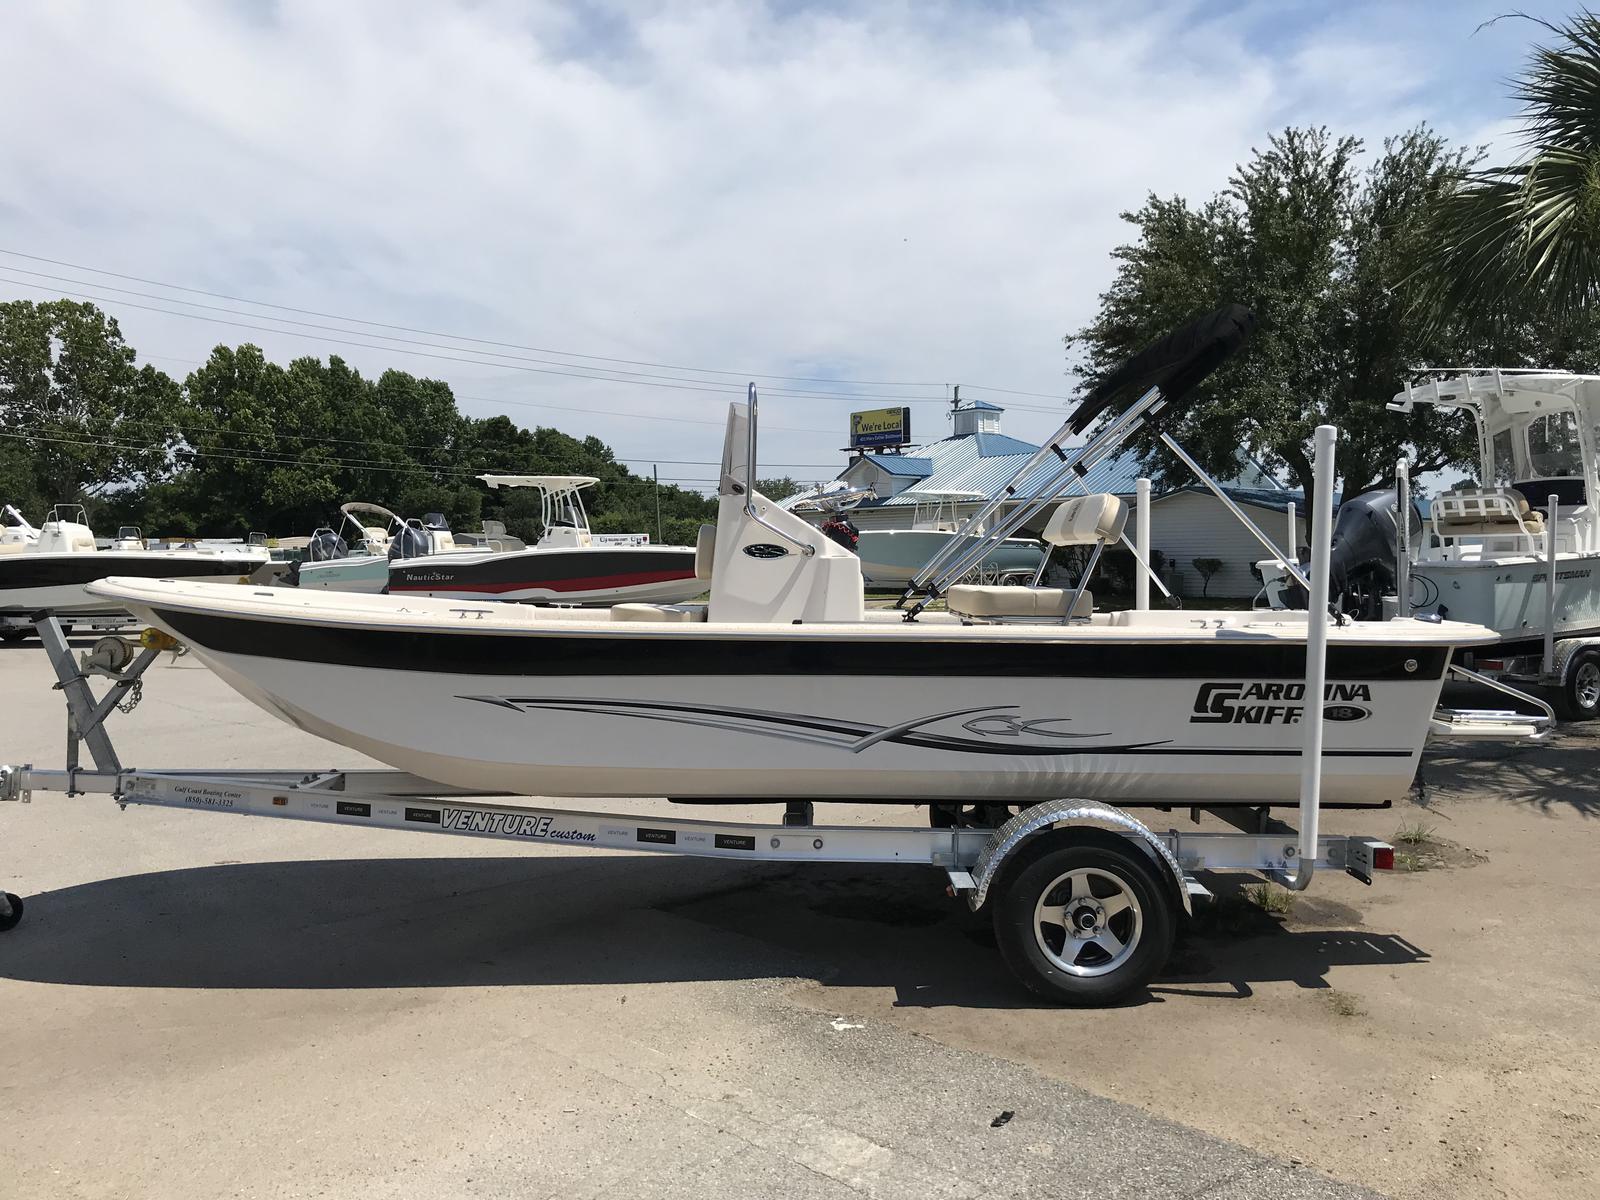 2018 Carolina Skiff 18 Jvx Cc For Sale In Fort Walton Beach Fl Cobia 17 Boat Wire Diagram Img 1582